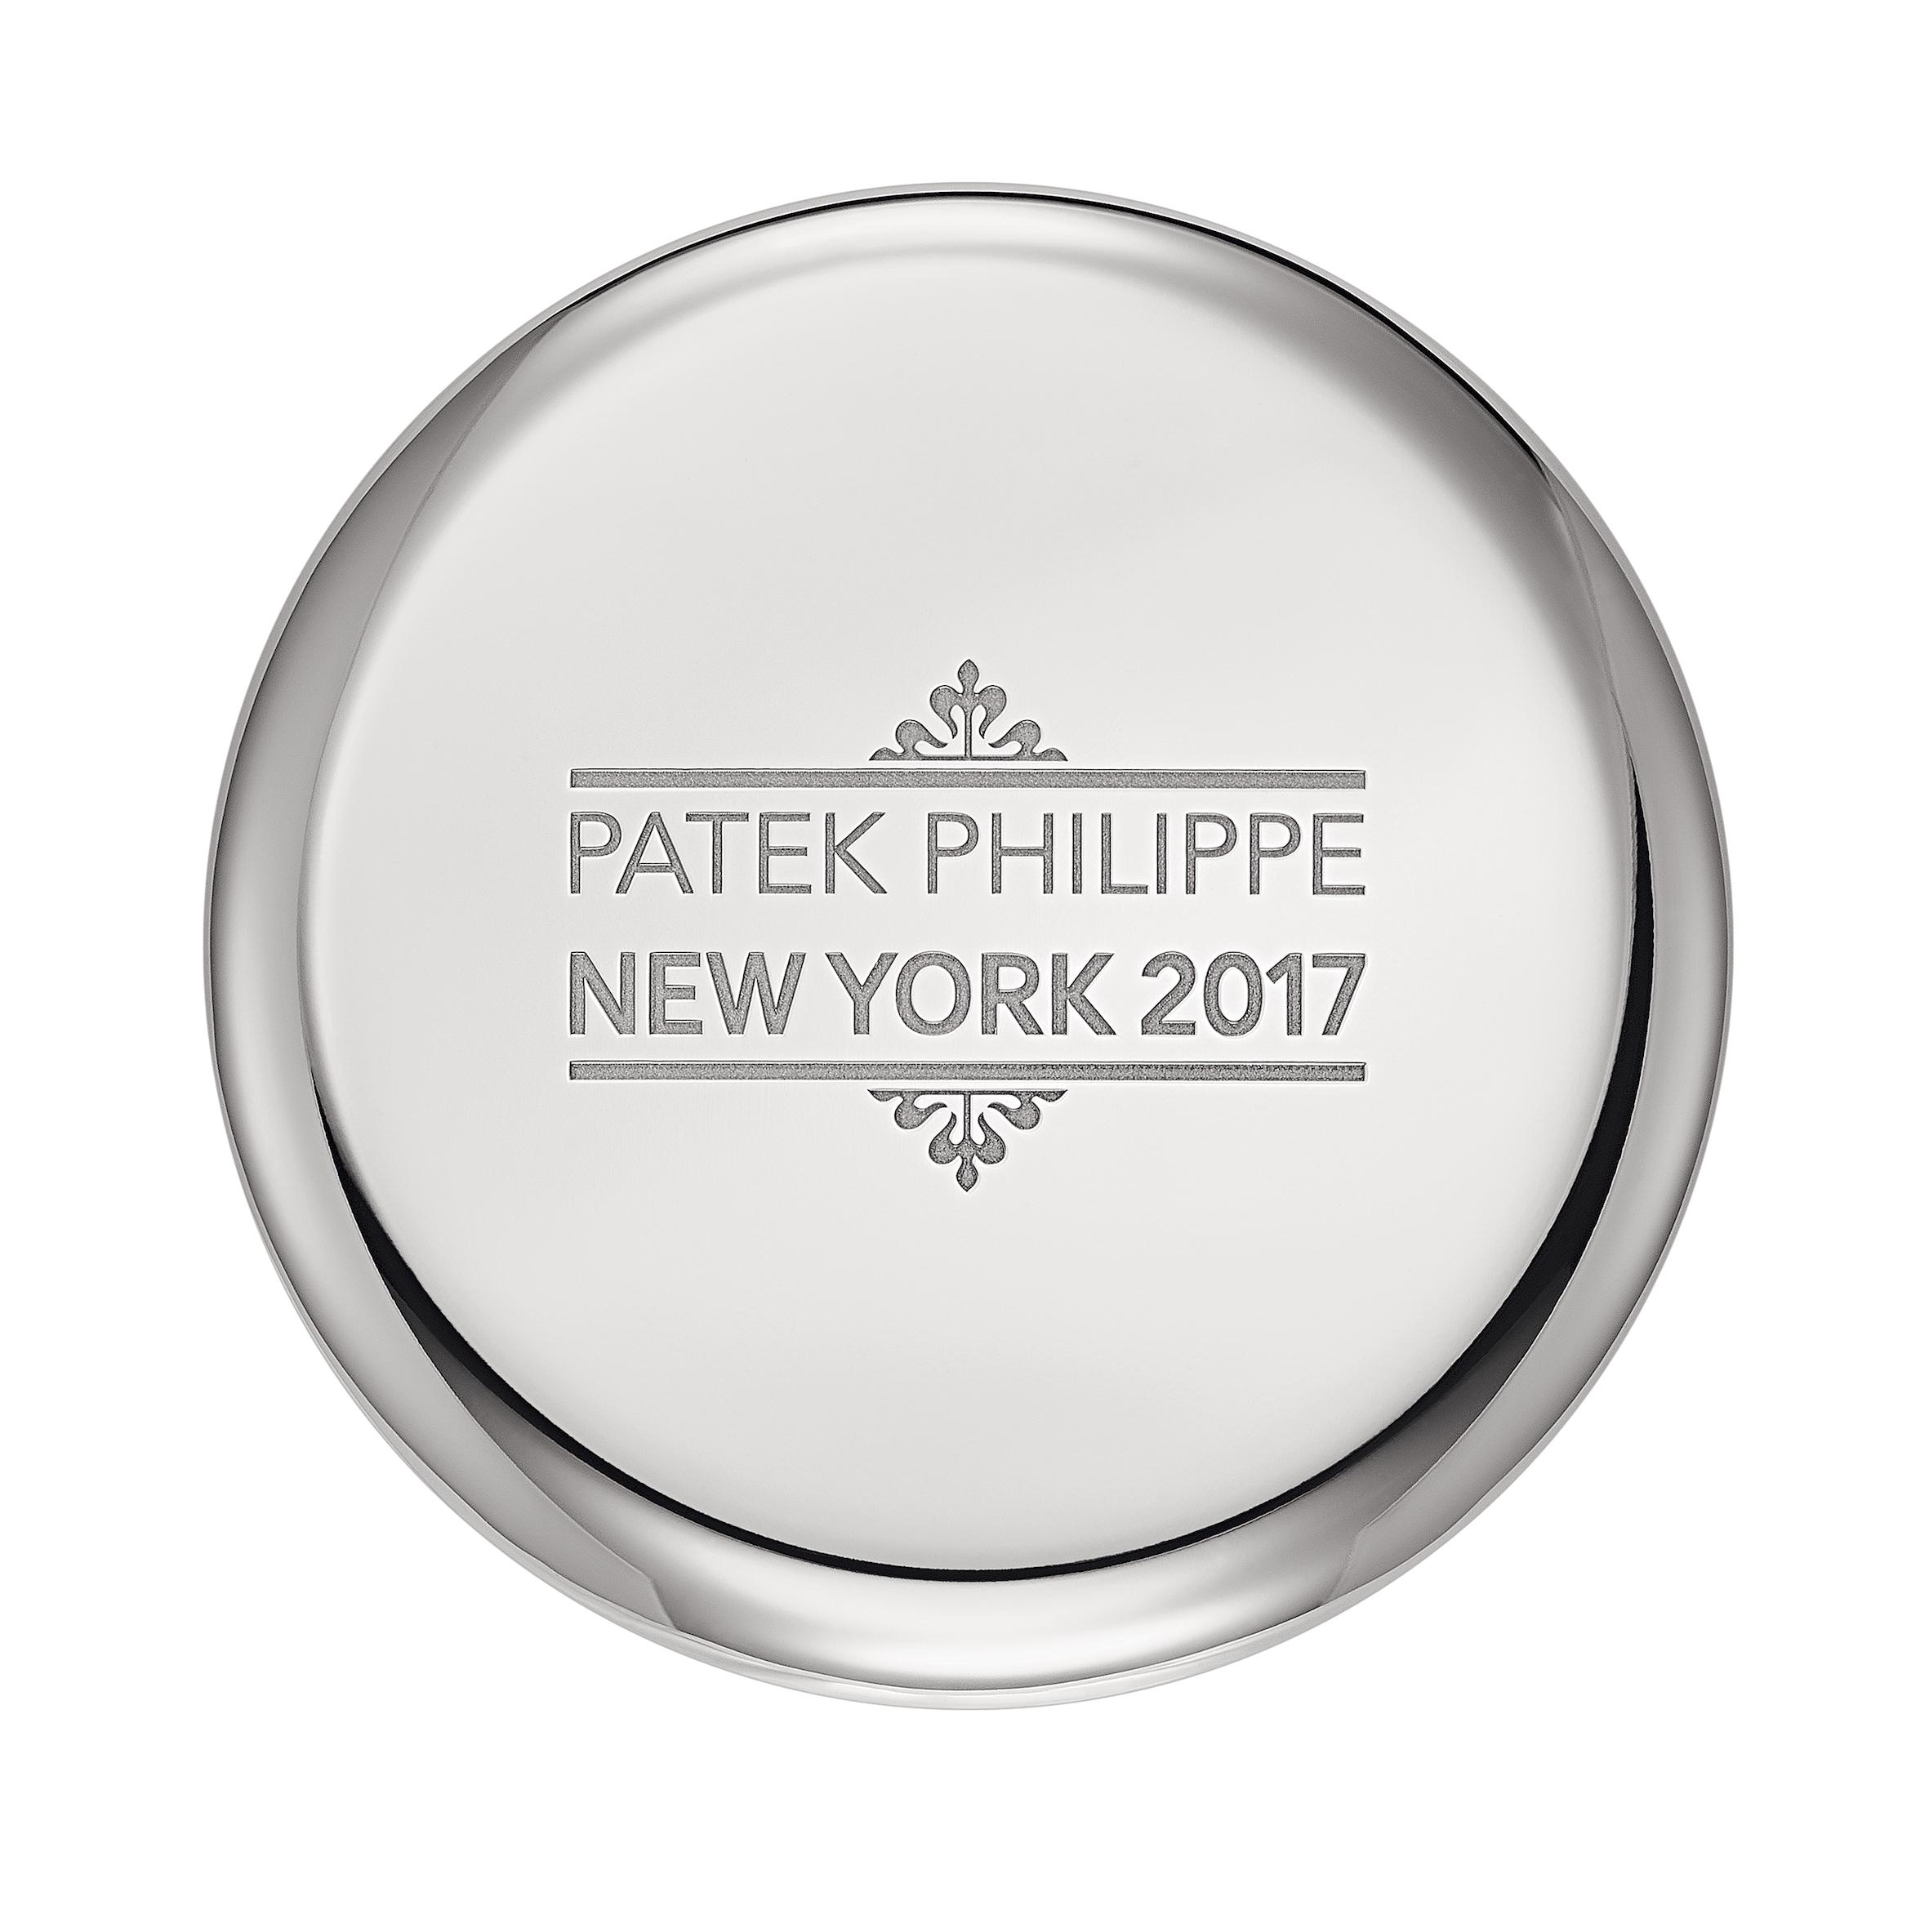 Patek Philippe Ladies' Minute Repeater Ref. 7000/250 New York 2017 Special Edition